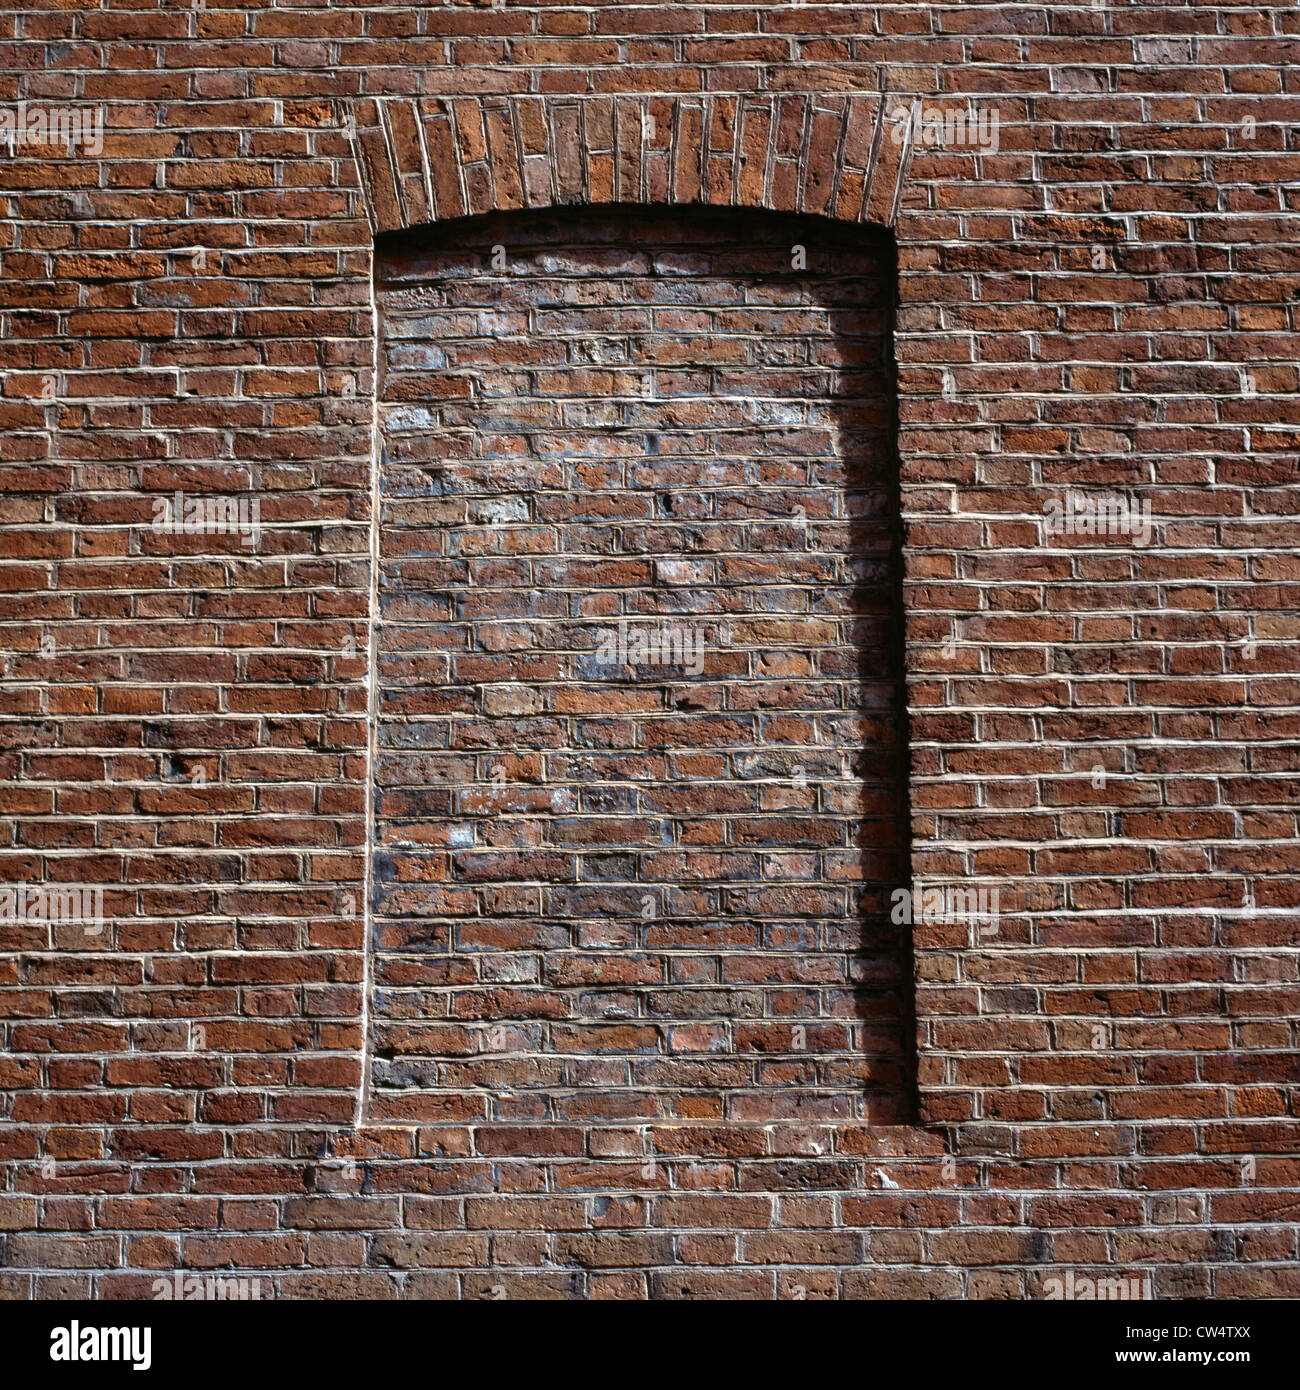 Brickedup window Stock Photo Royalty Free Image 49894514  Alamy